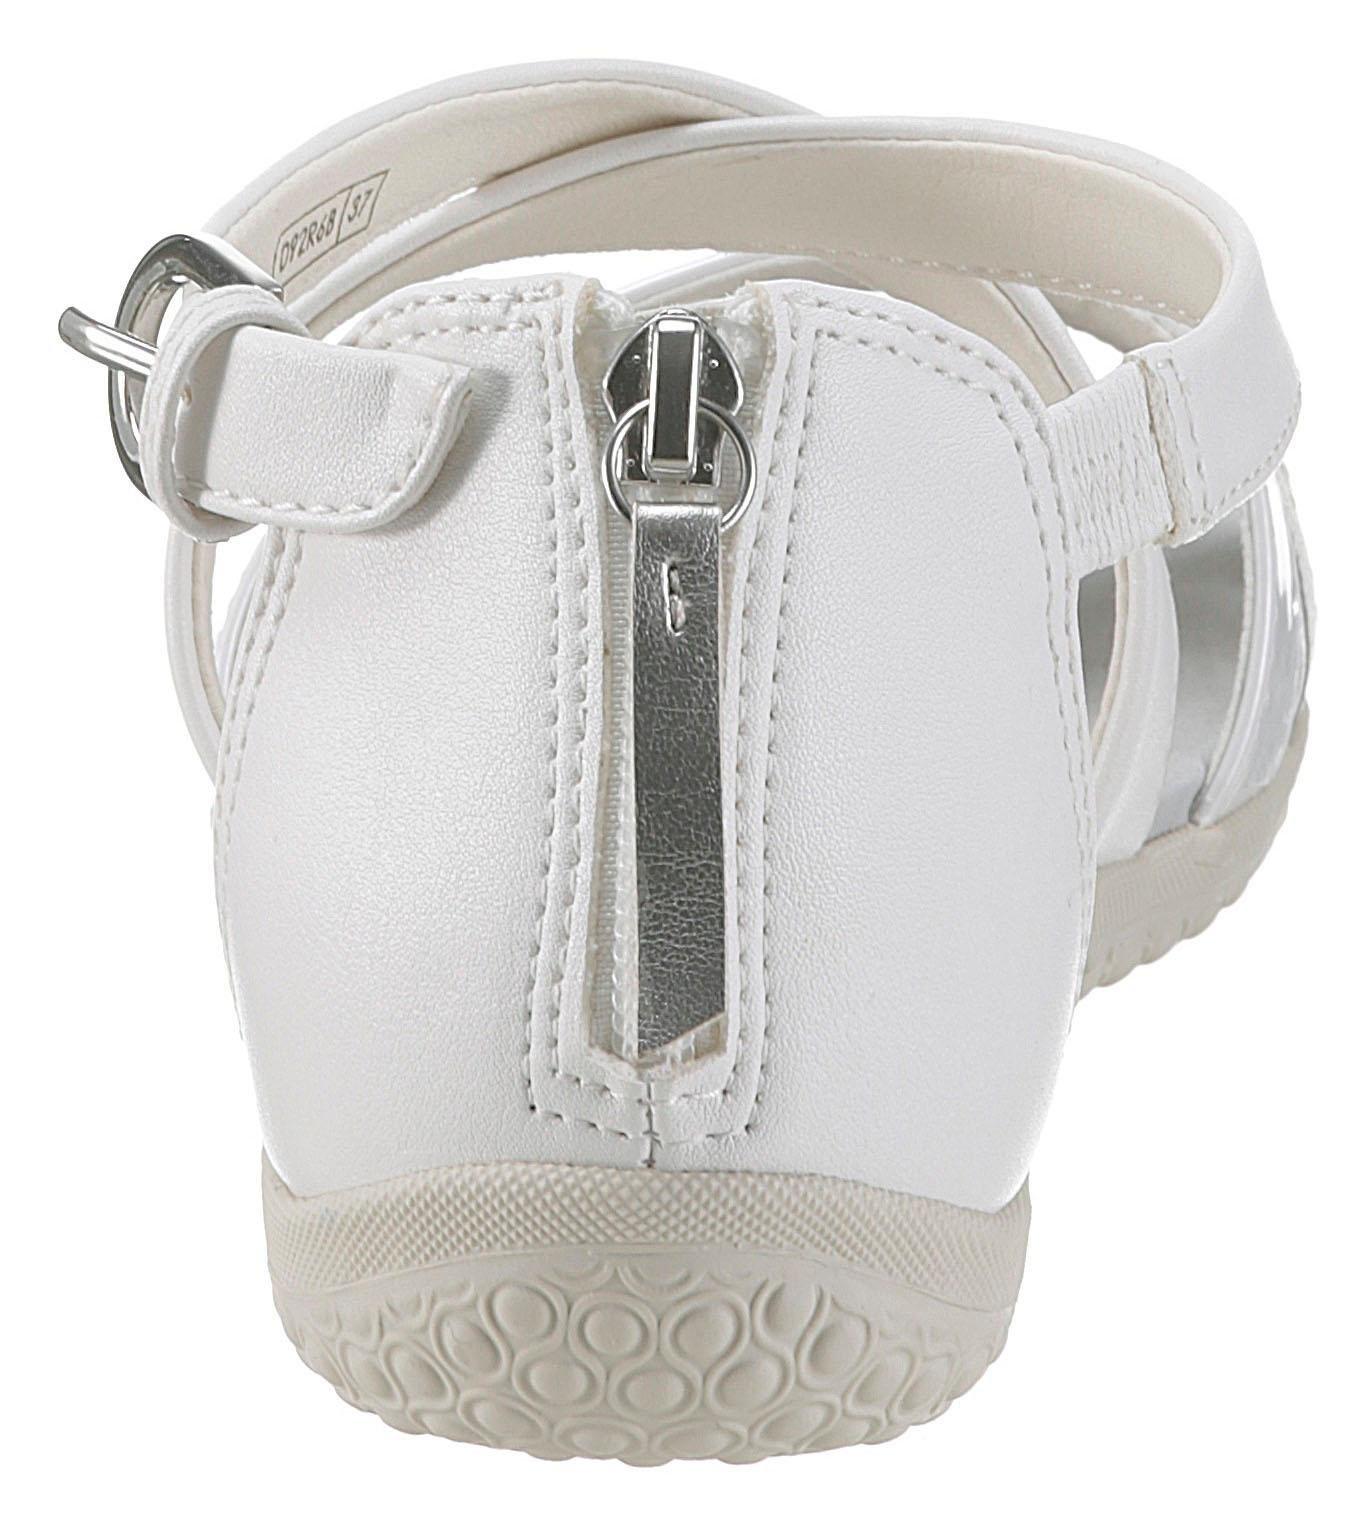 Sandalendonna Shoppen Online Vega Geox Sandal kuPZOiX